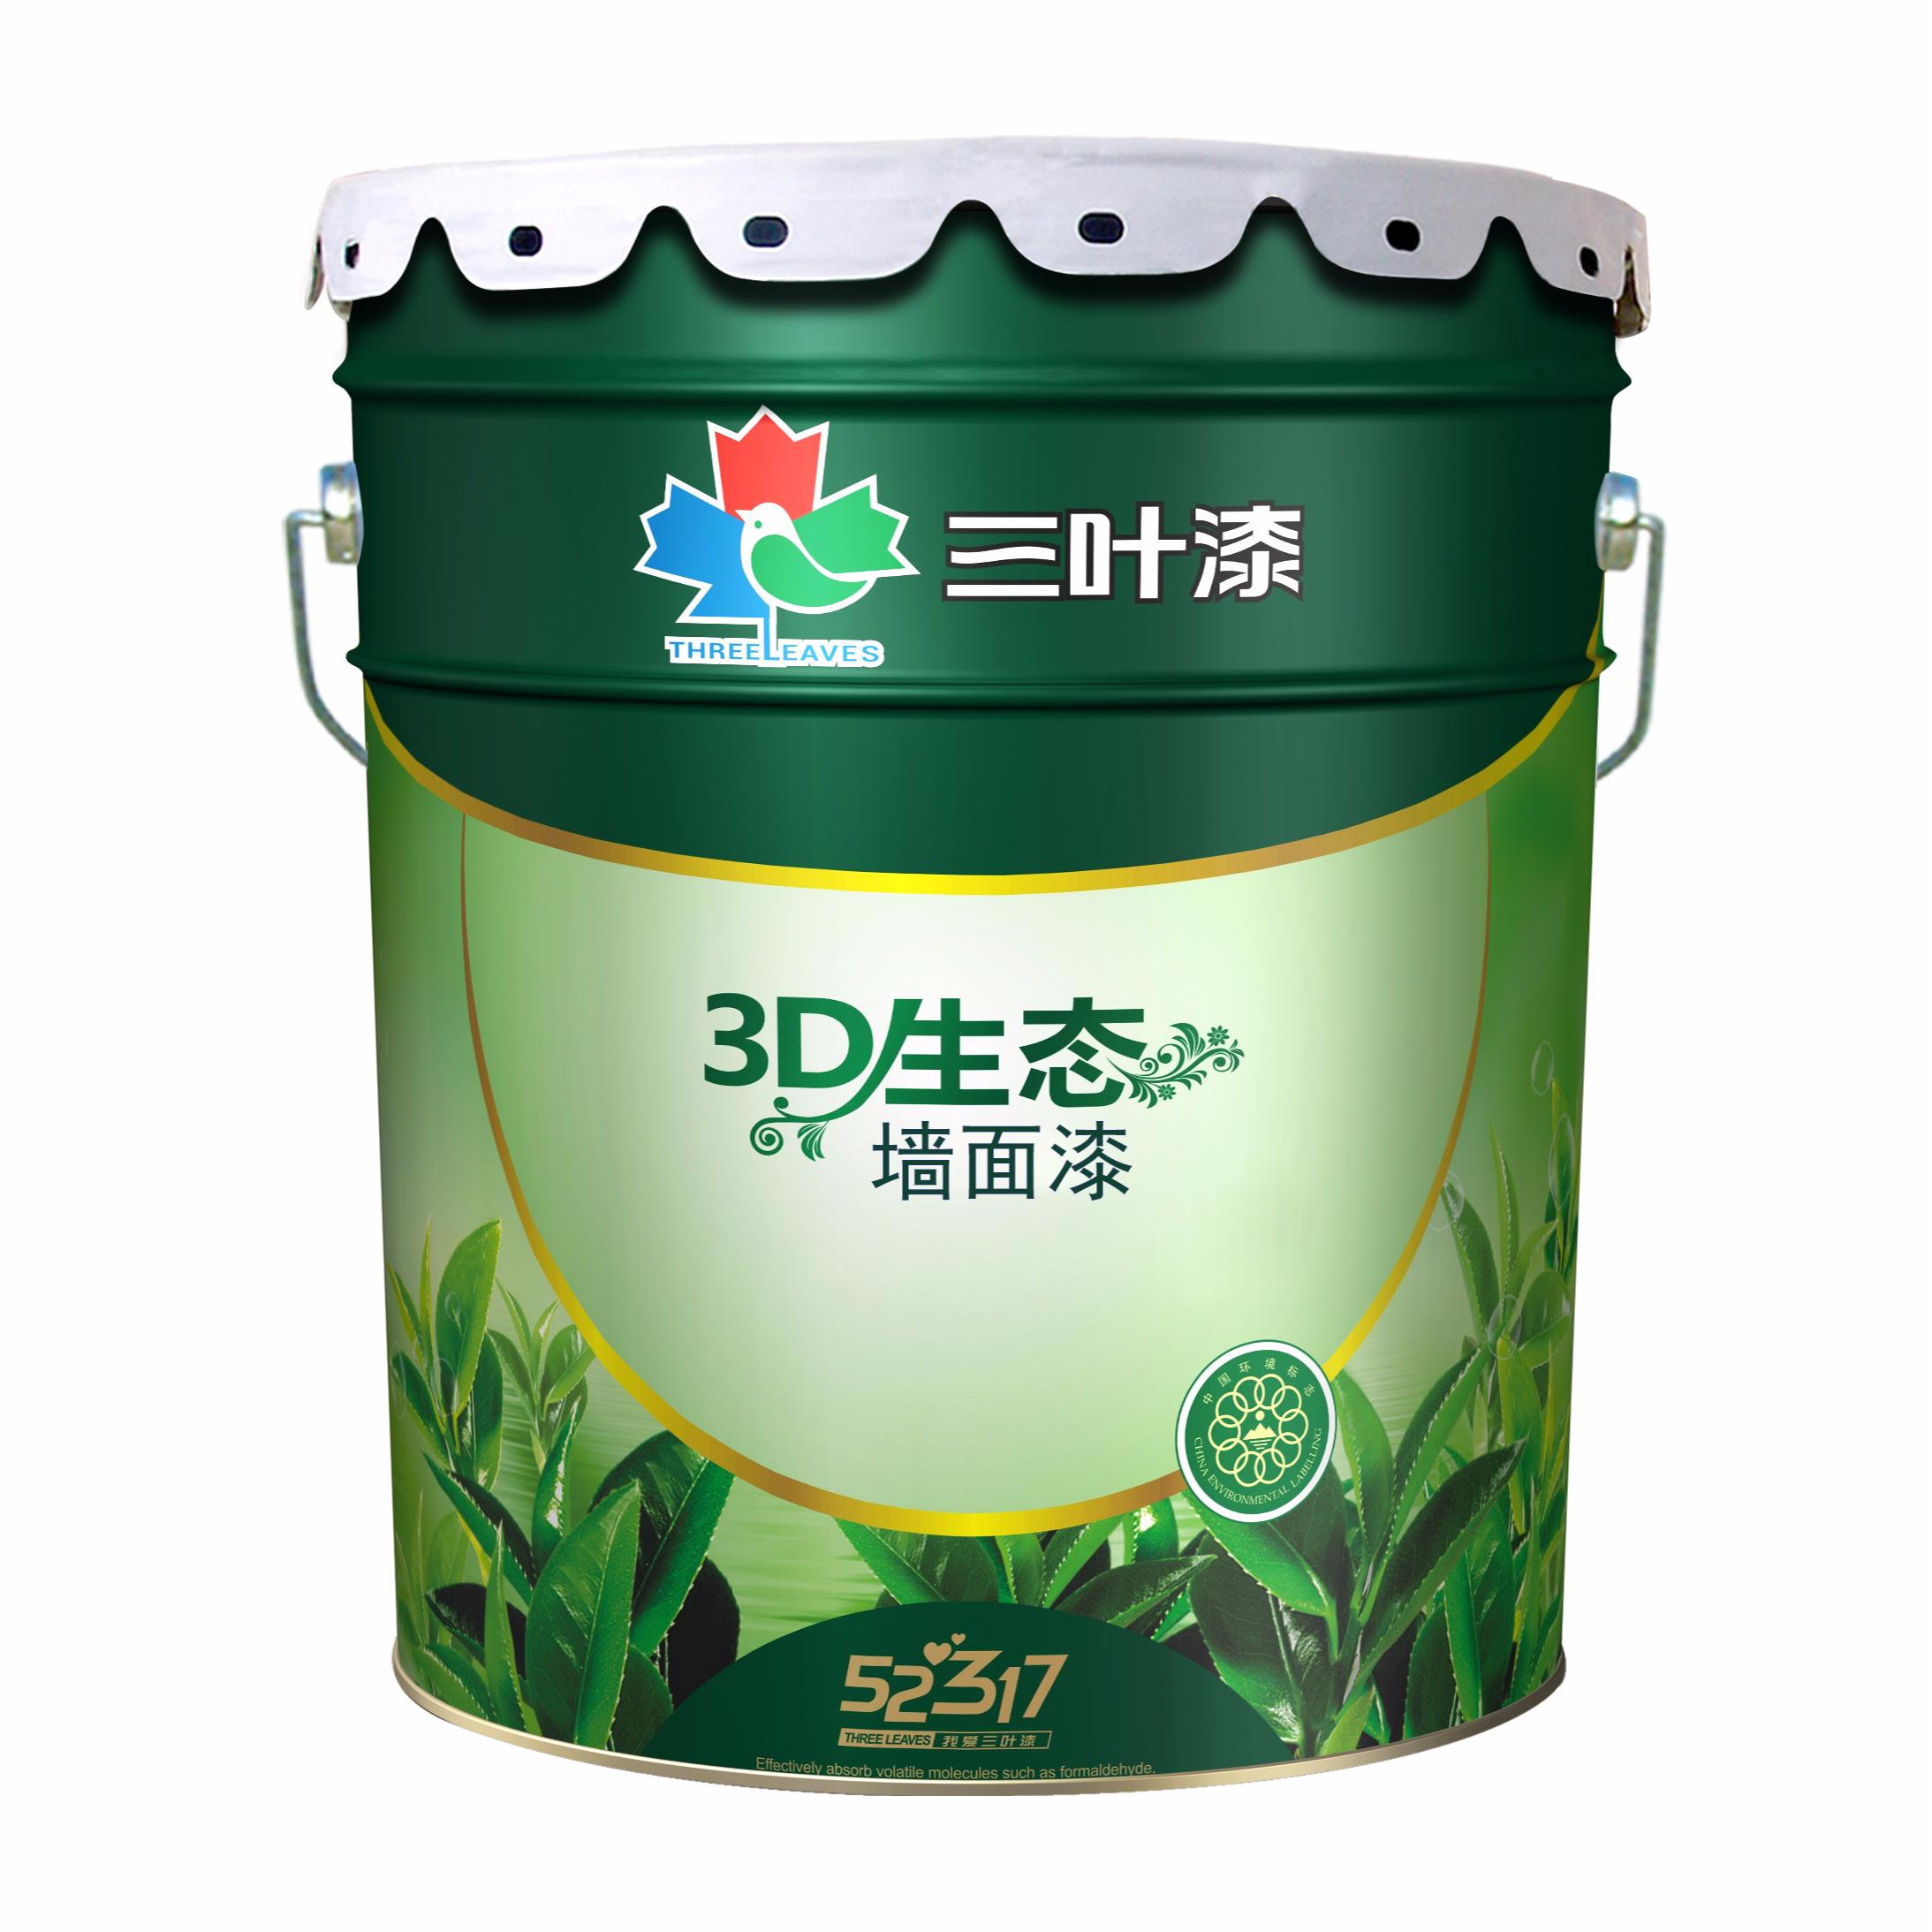 3D生态墙面漆